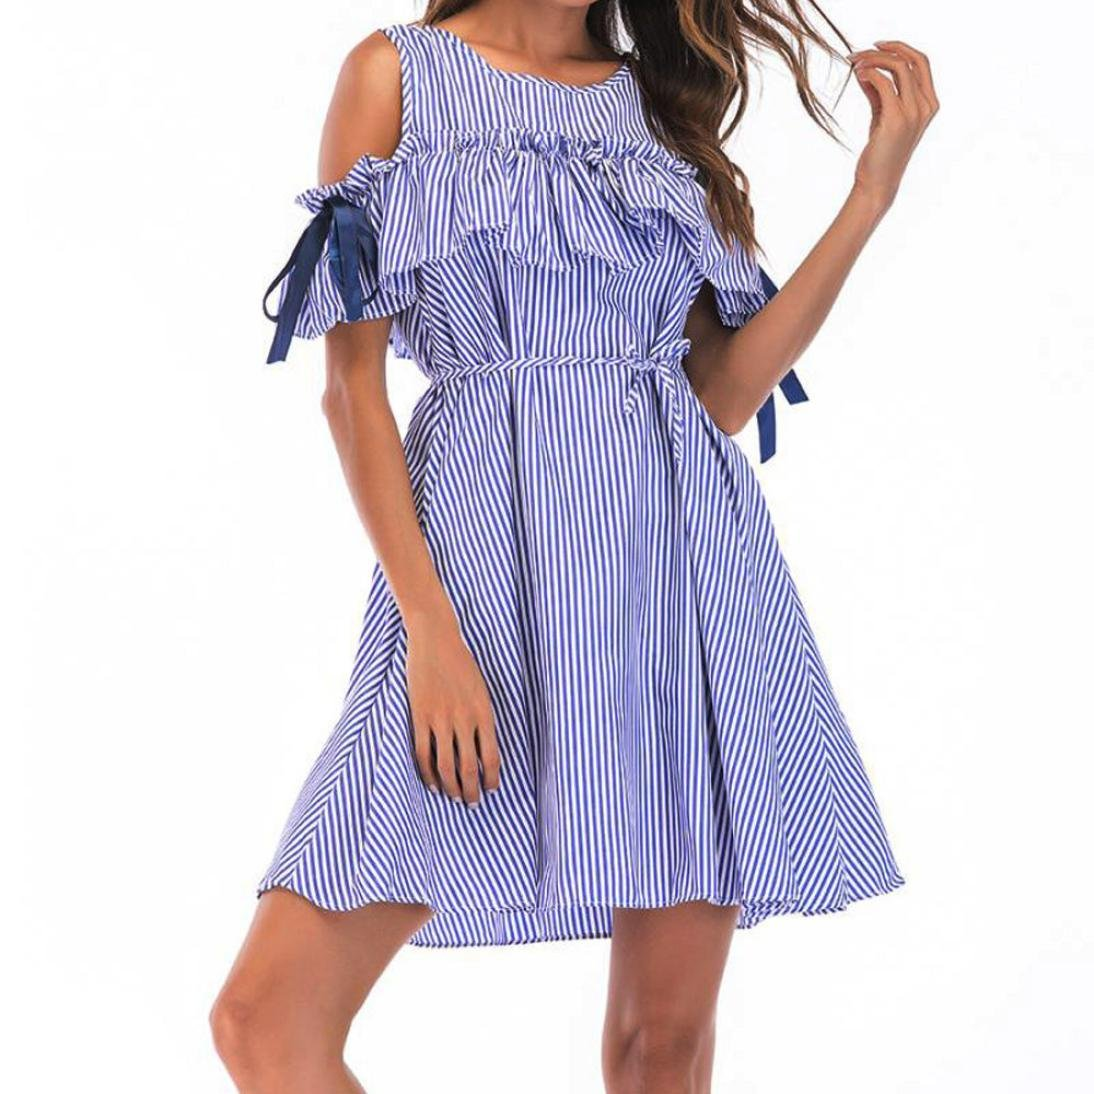 9c1d39fa7e44 Amazon.com  Clearance! Women s Dress